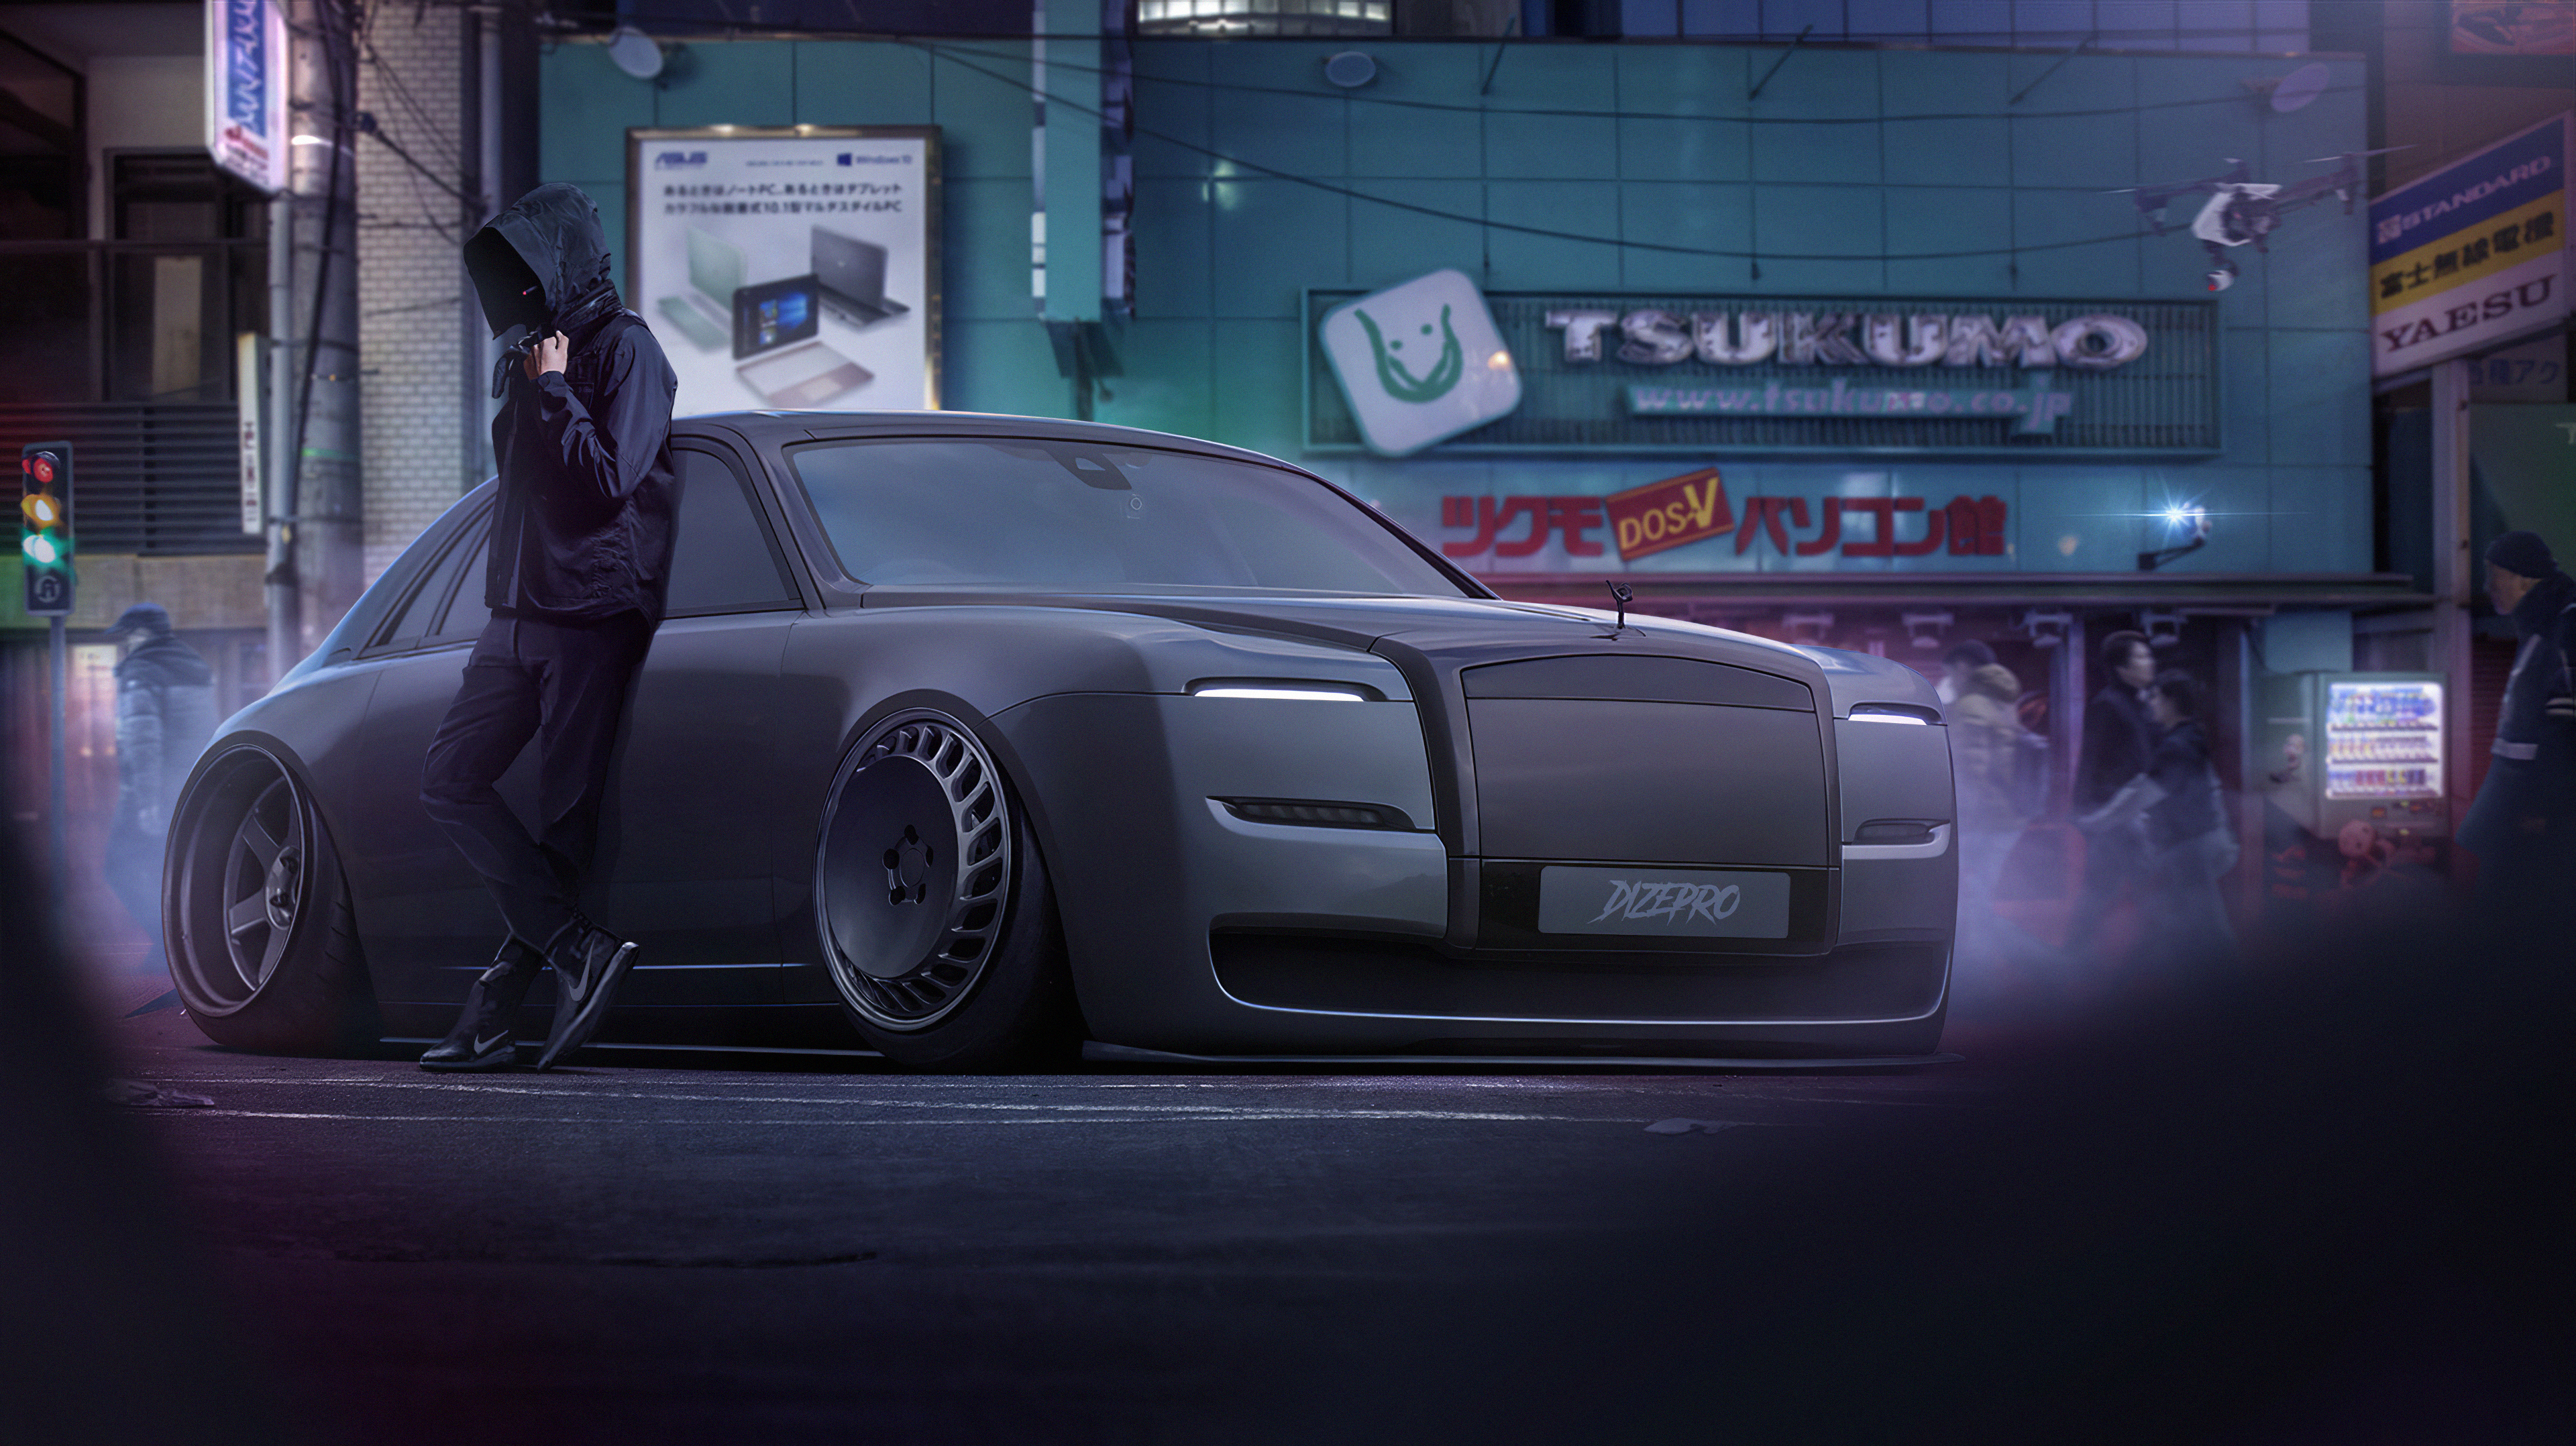 the dark rolls royce 1574936161 - The Dark Rolls Royce -